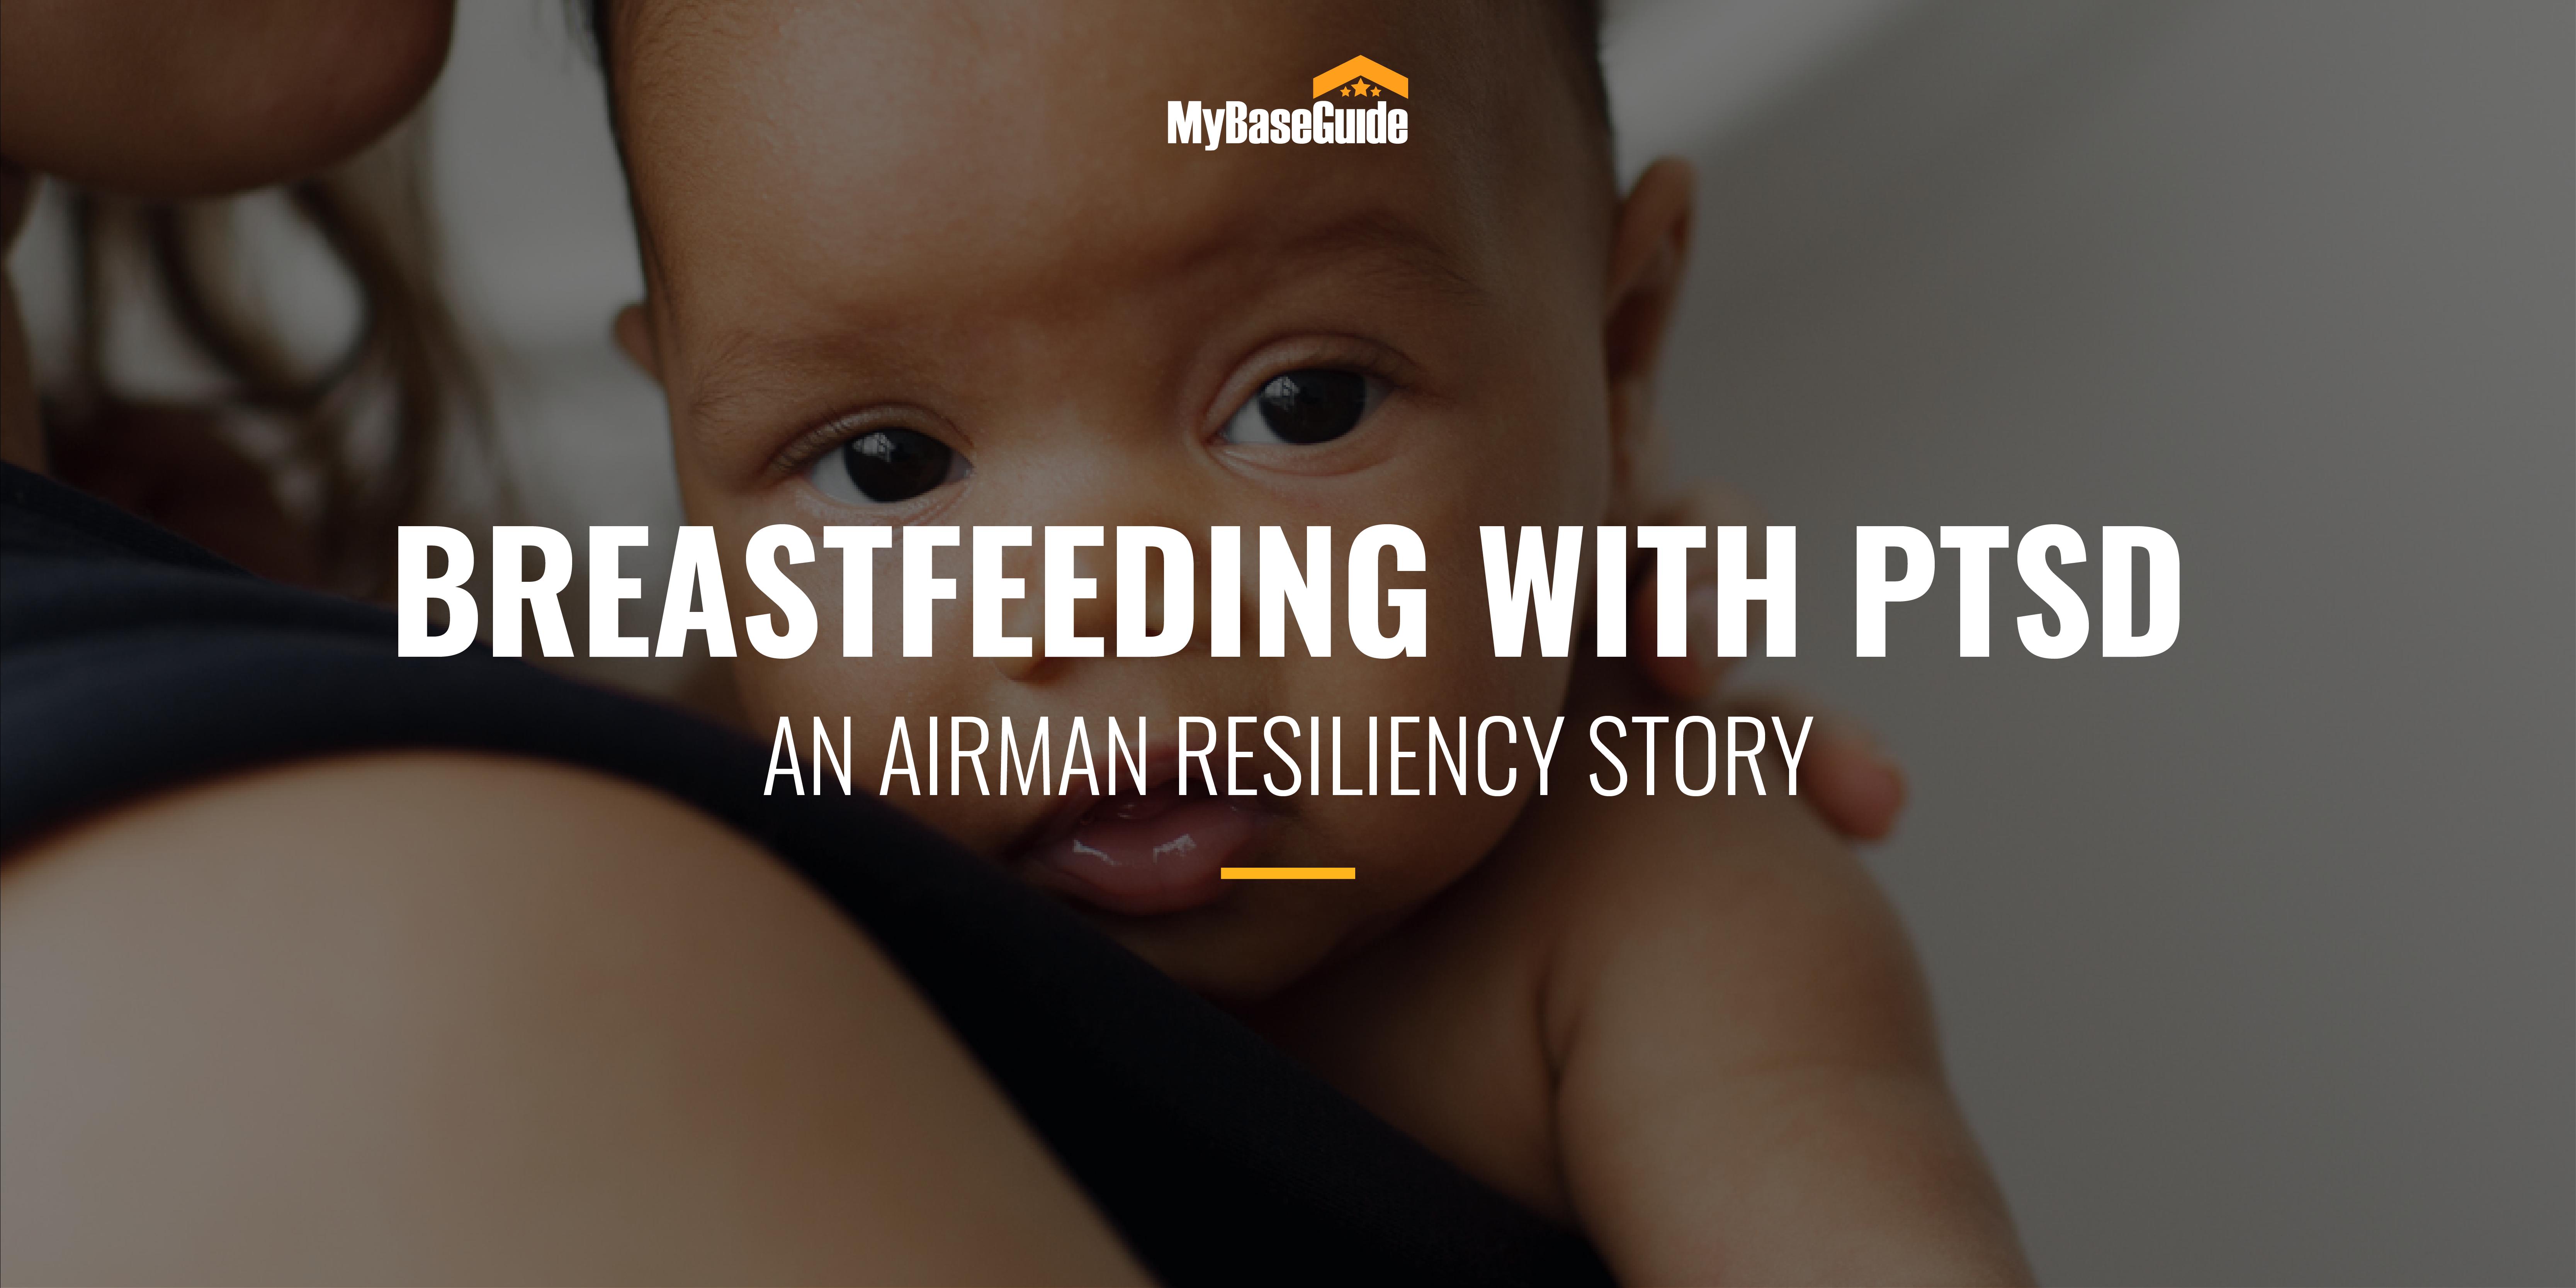 Breastfeeding with PTSD